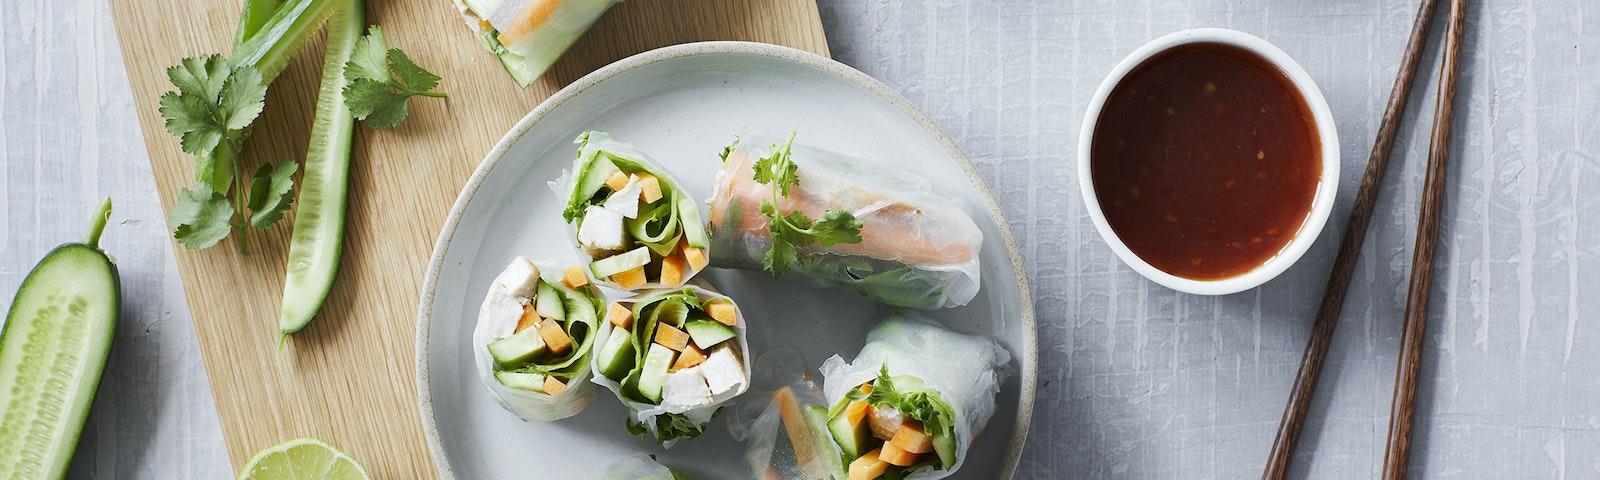 Vietnamesiske forårsruller med kylling og grønt